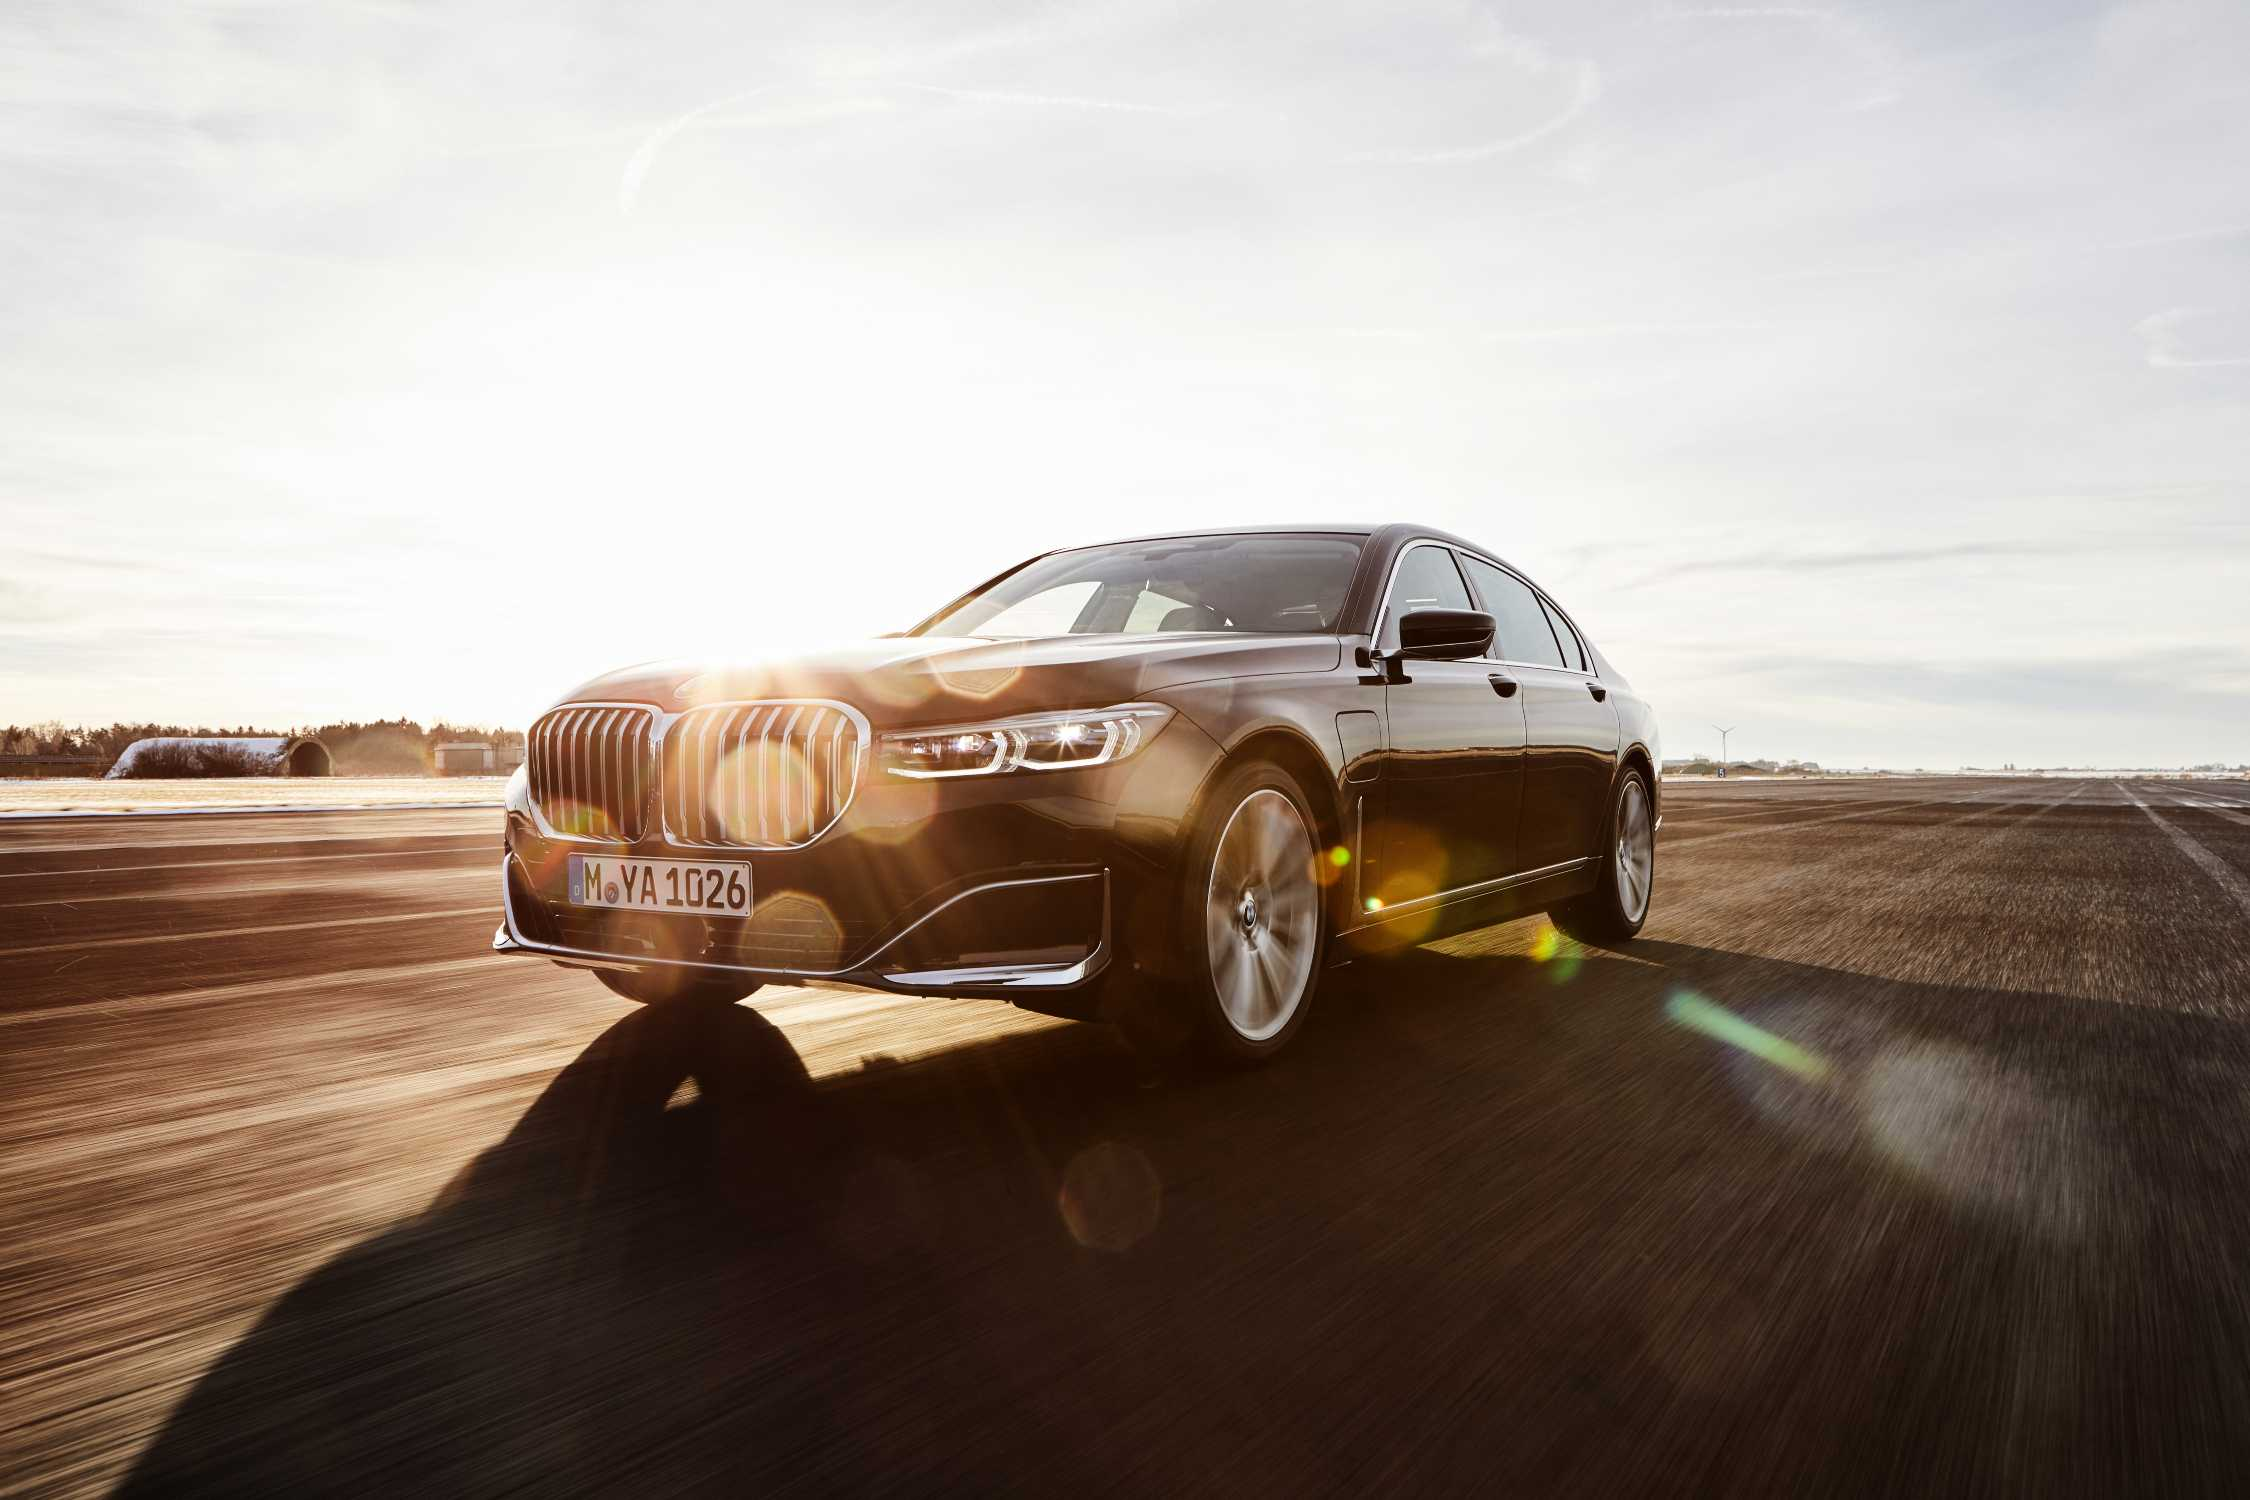 The new BMW 7 Series Plug-in Hybrid